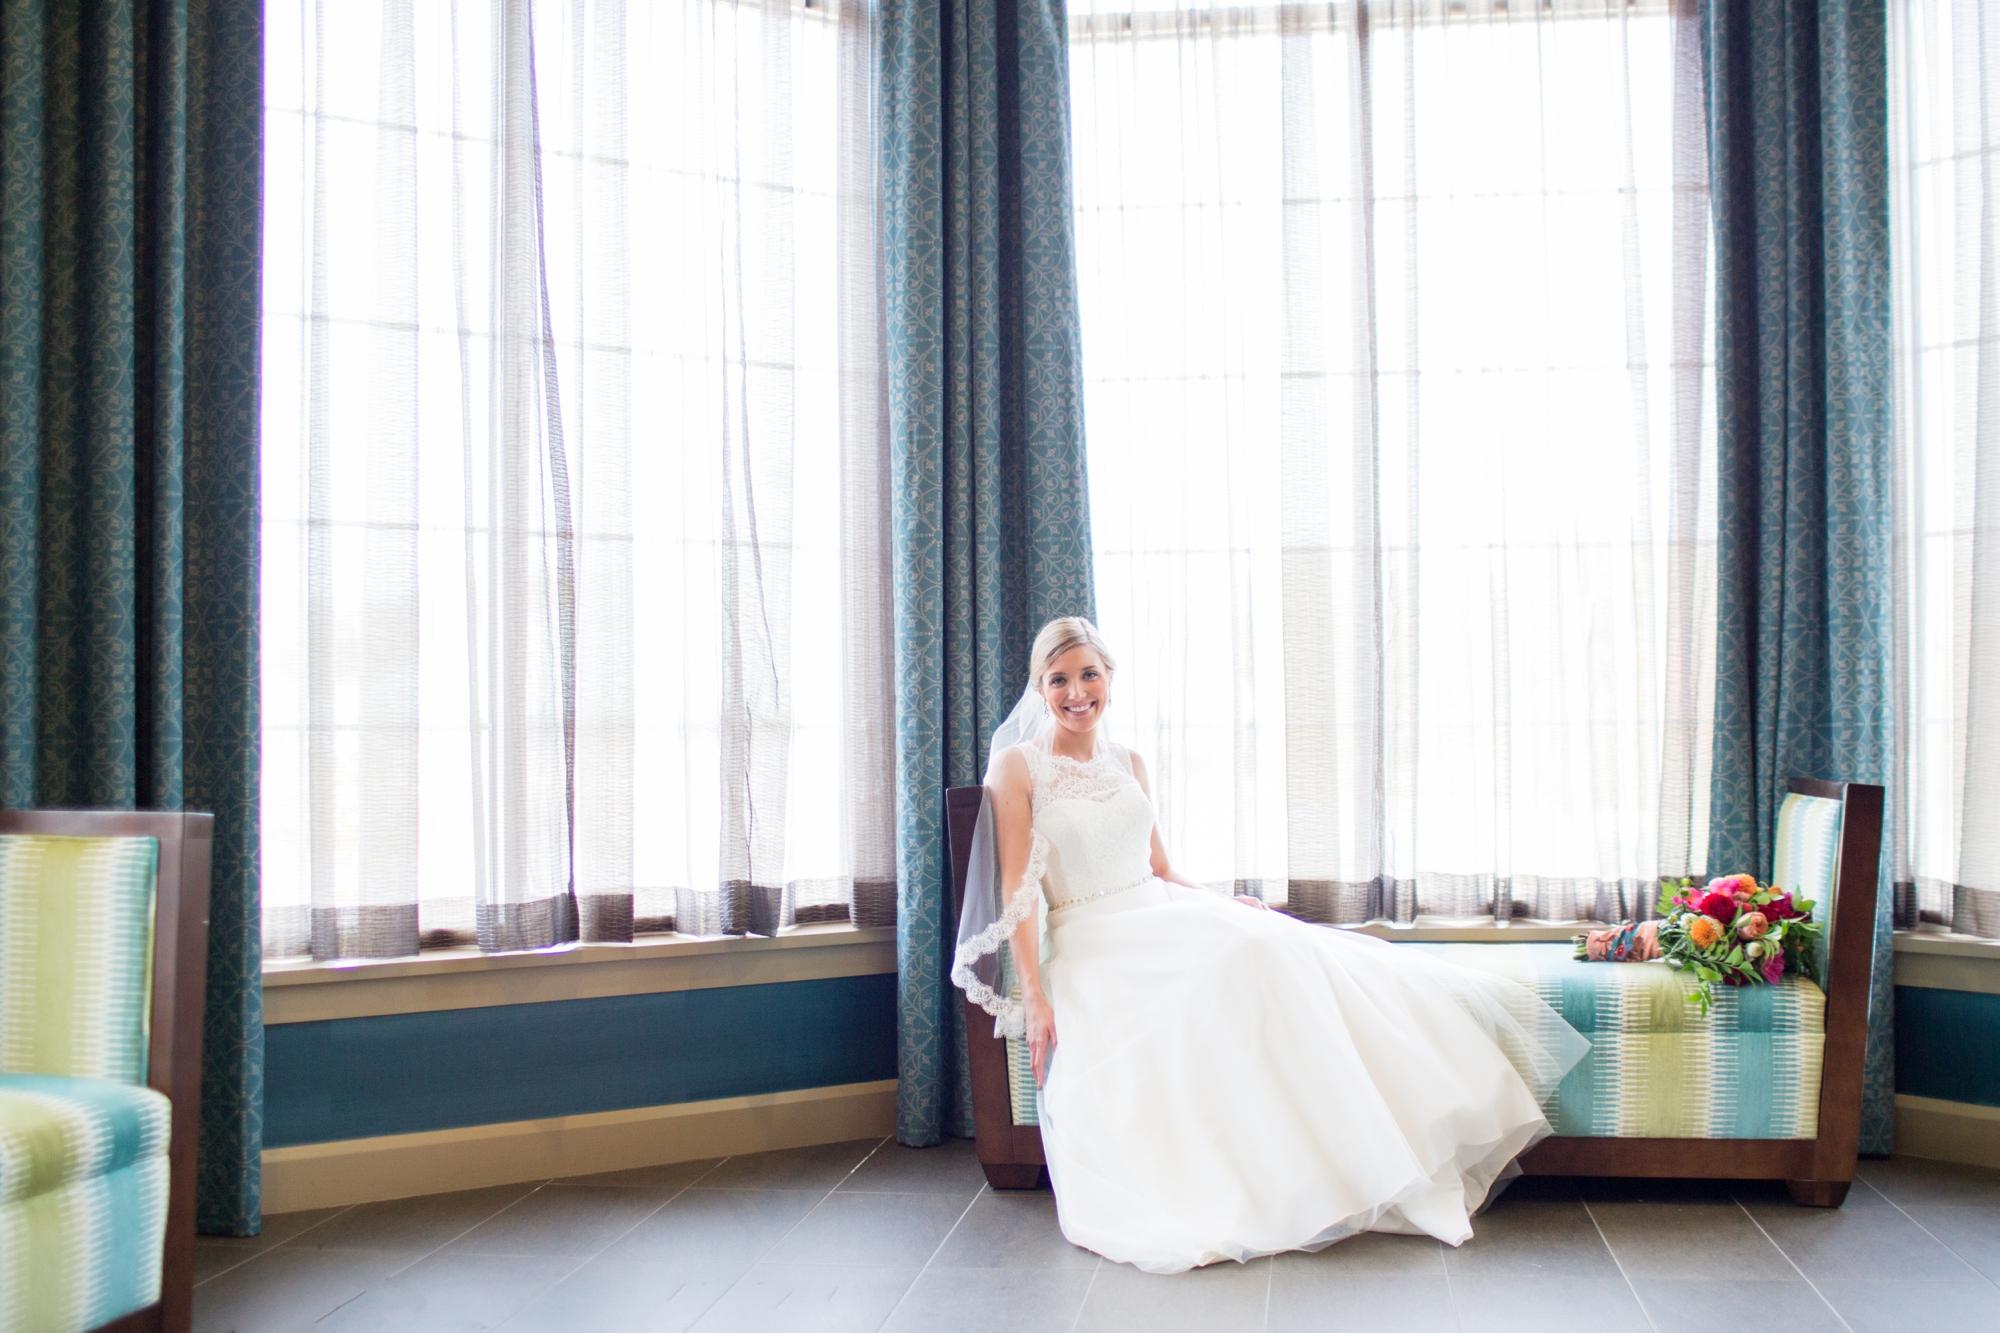 1-Finkel Wedding Getting Ready-151_anna grace photography maryland wedding photographer turf valley.jpg